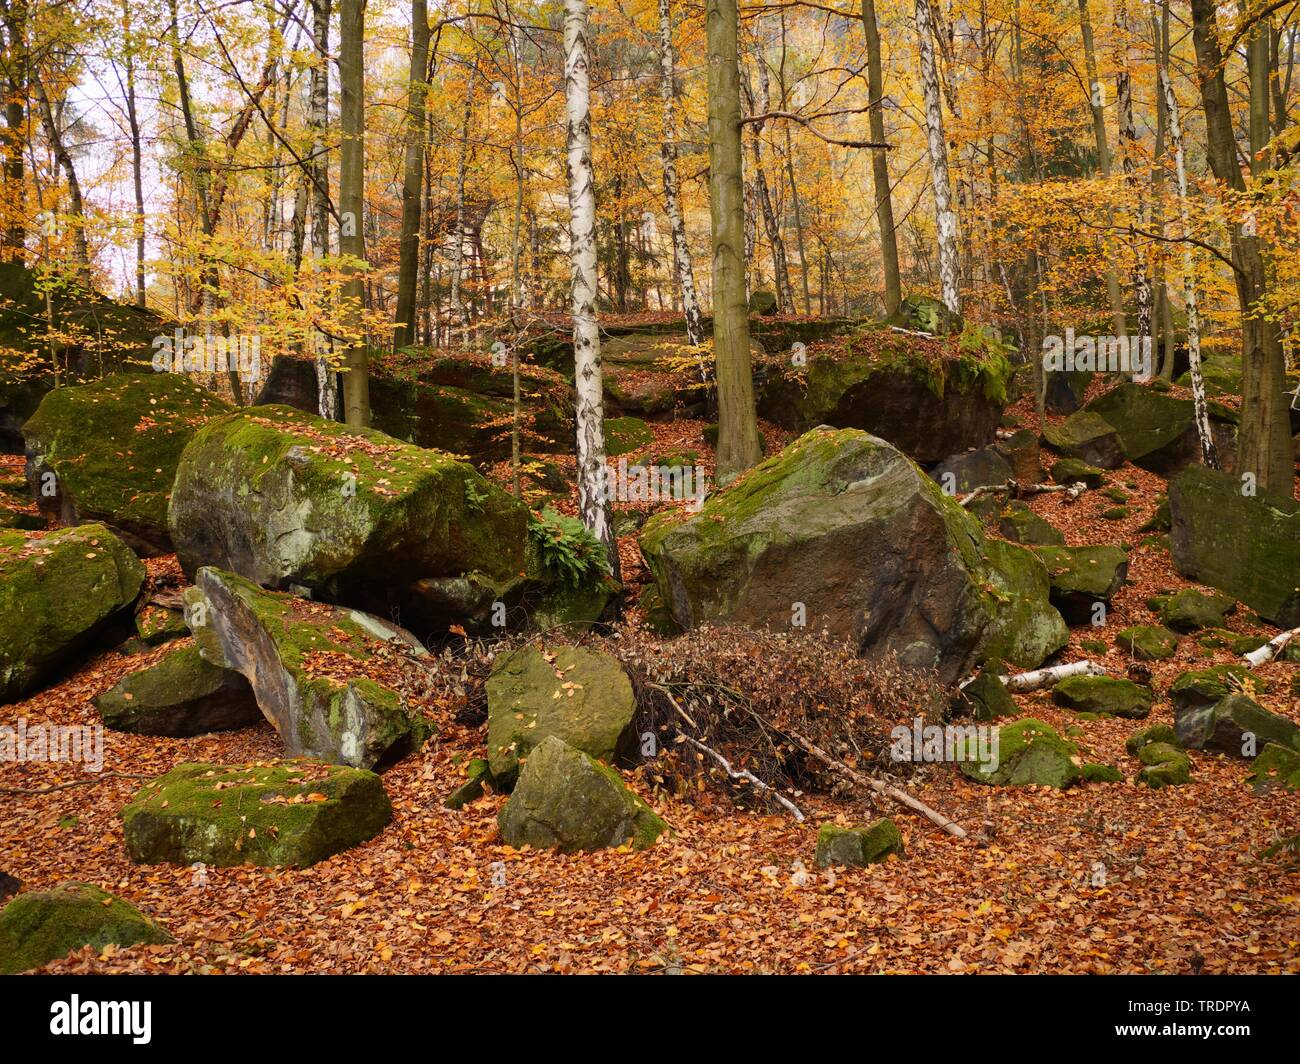 autumn forest of Elbsandsteingebirge, Germany, Saxony, Saxon Switzerland National Park - Stock Image